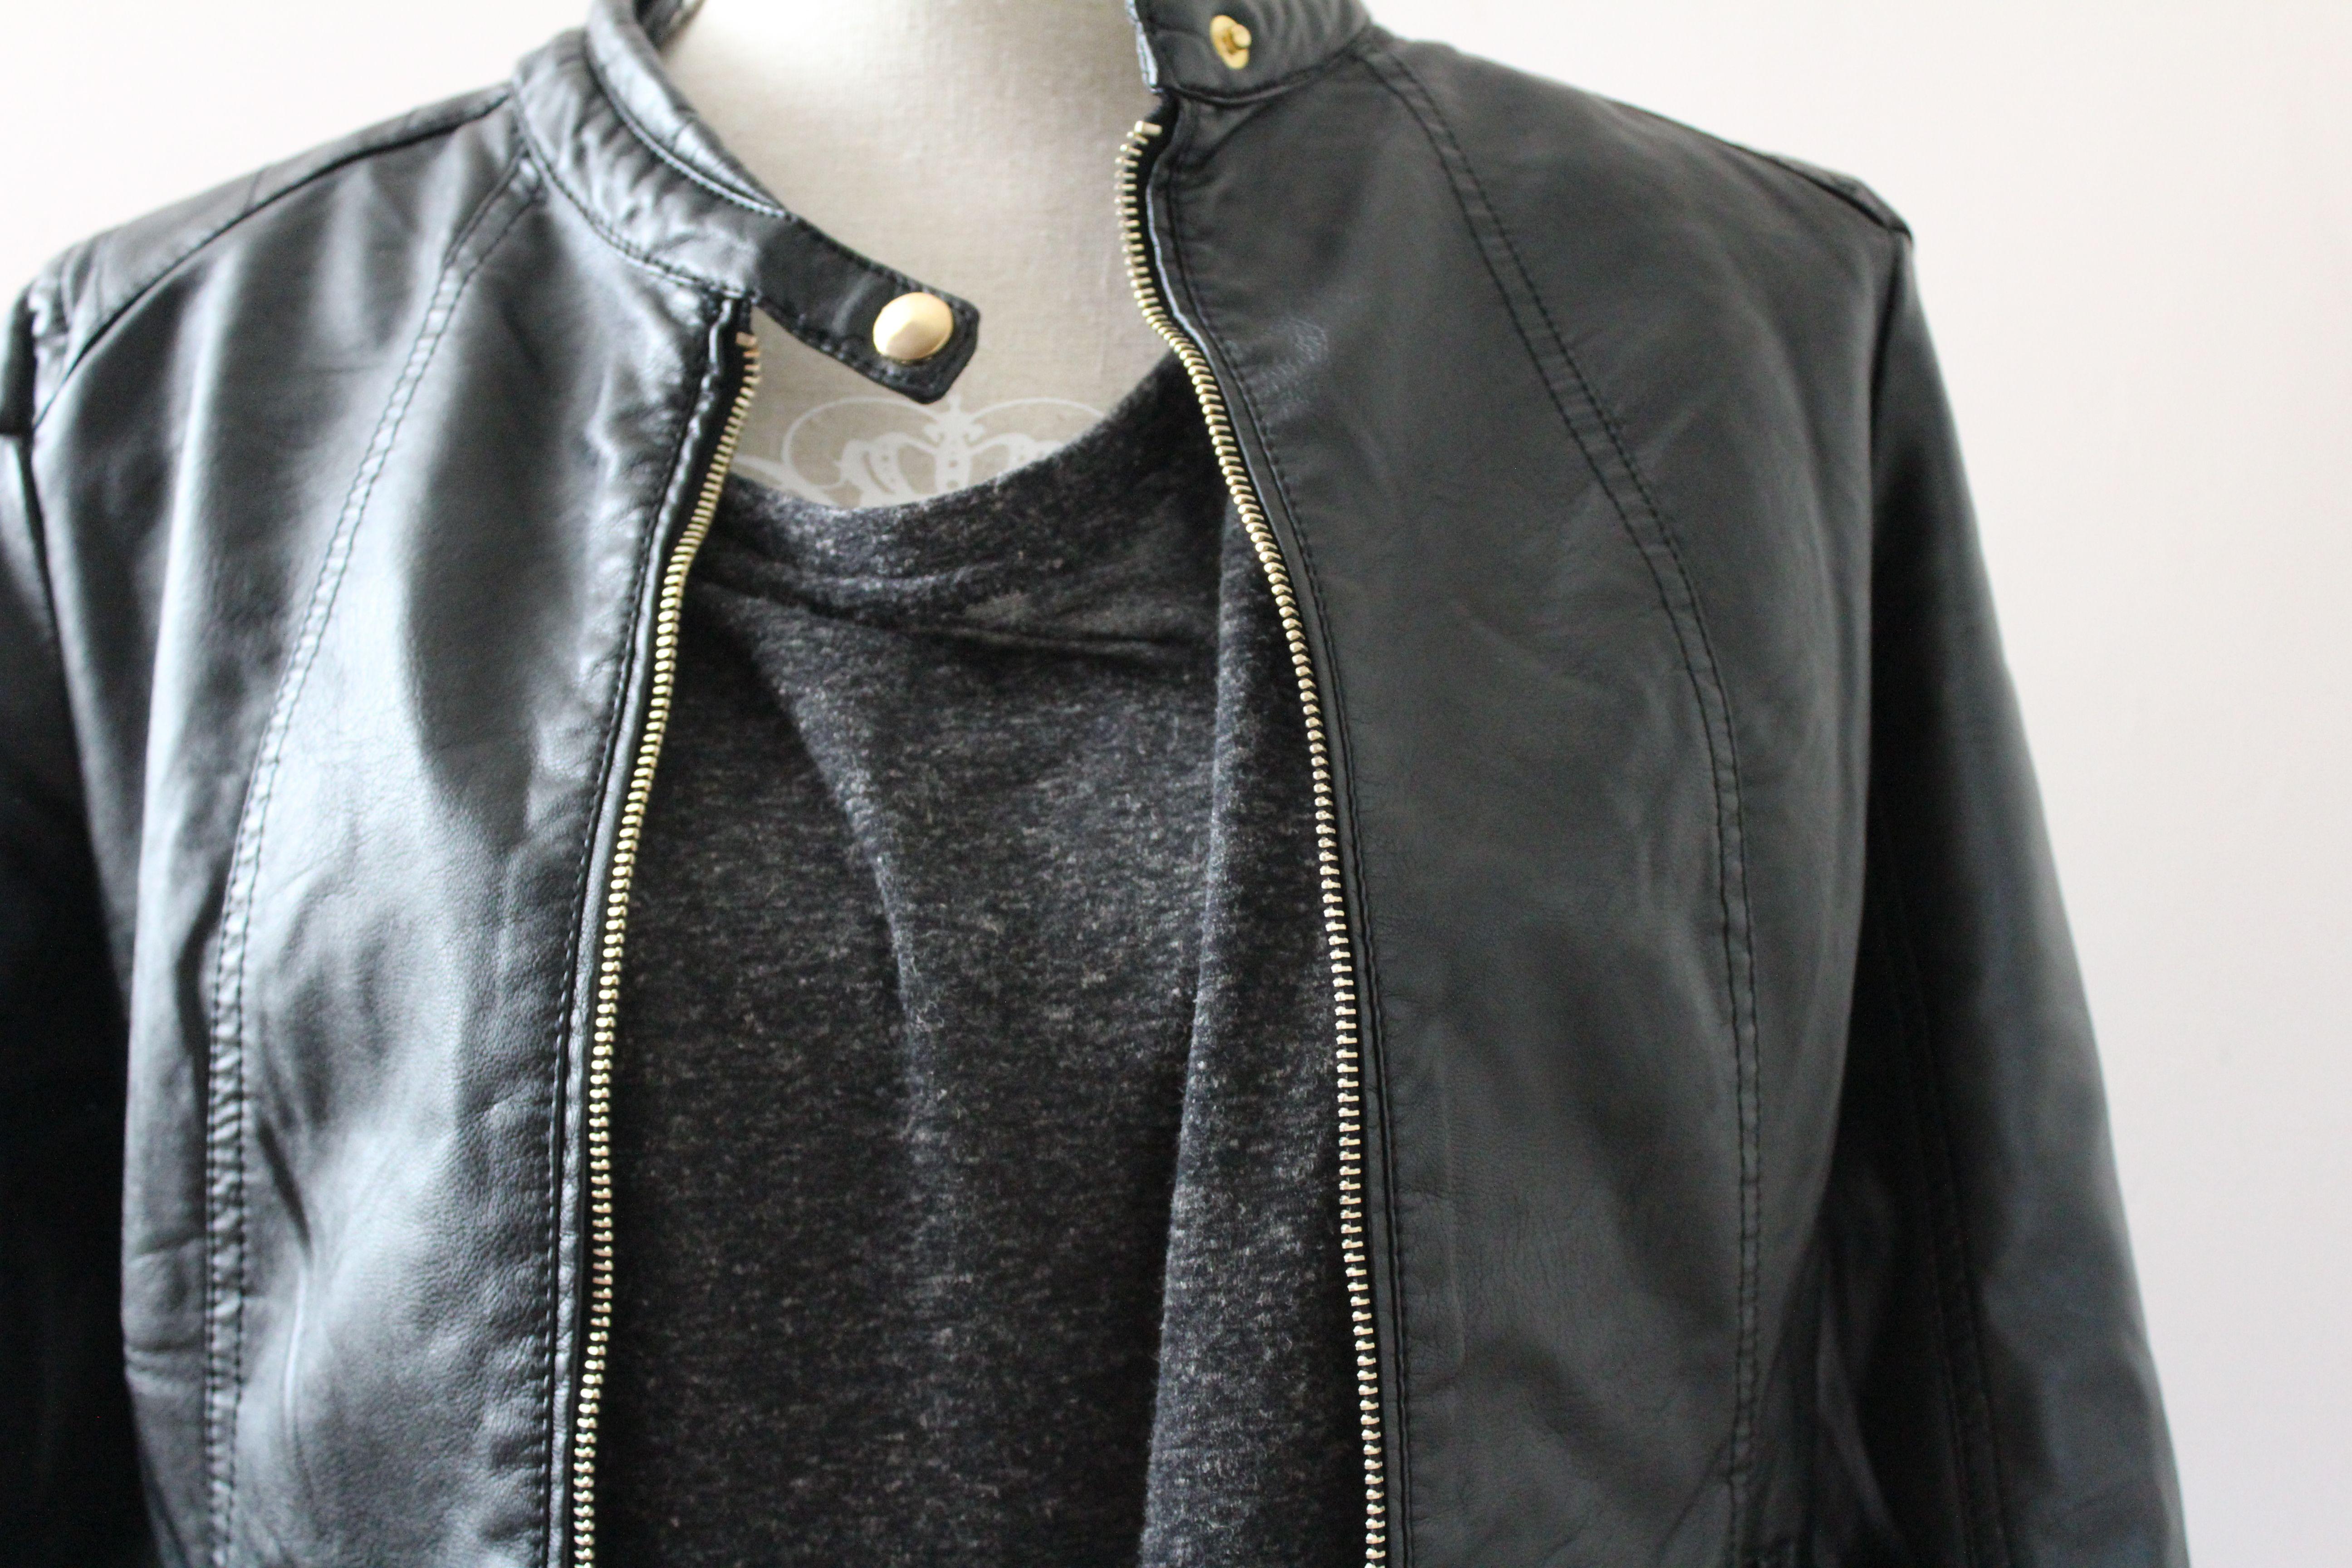 my new black leather jacket!